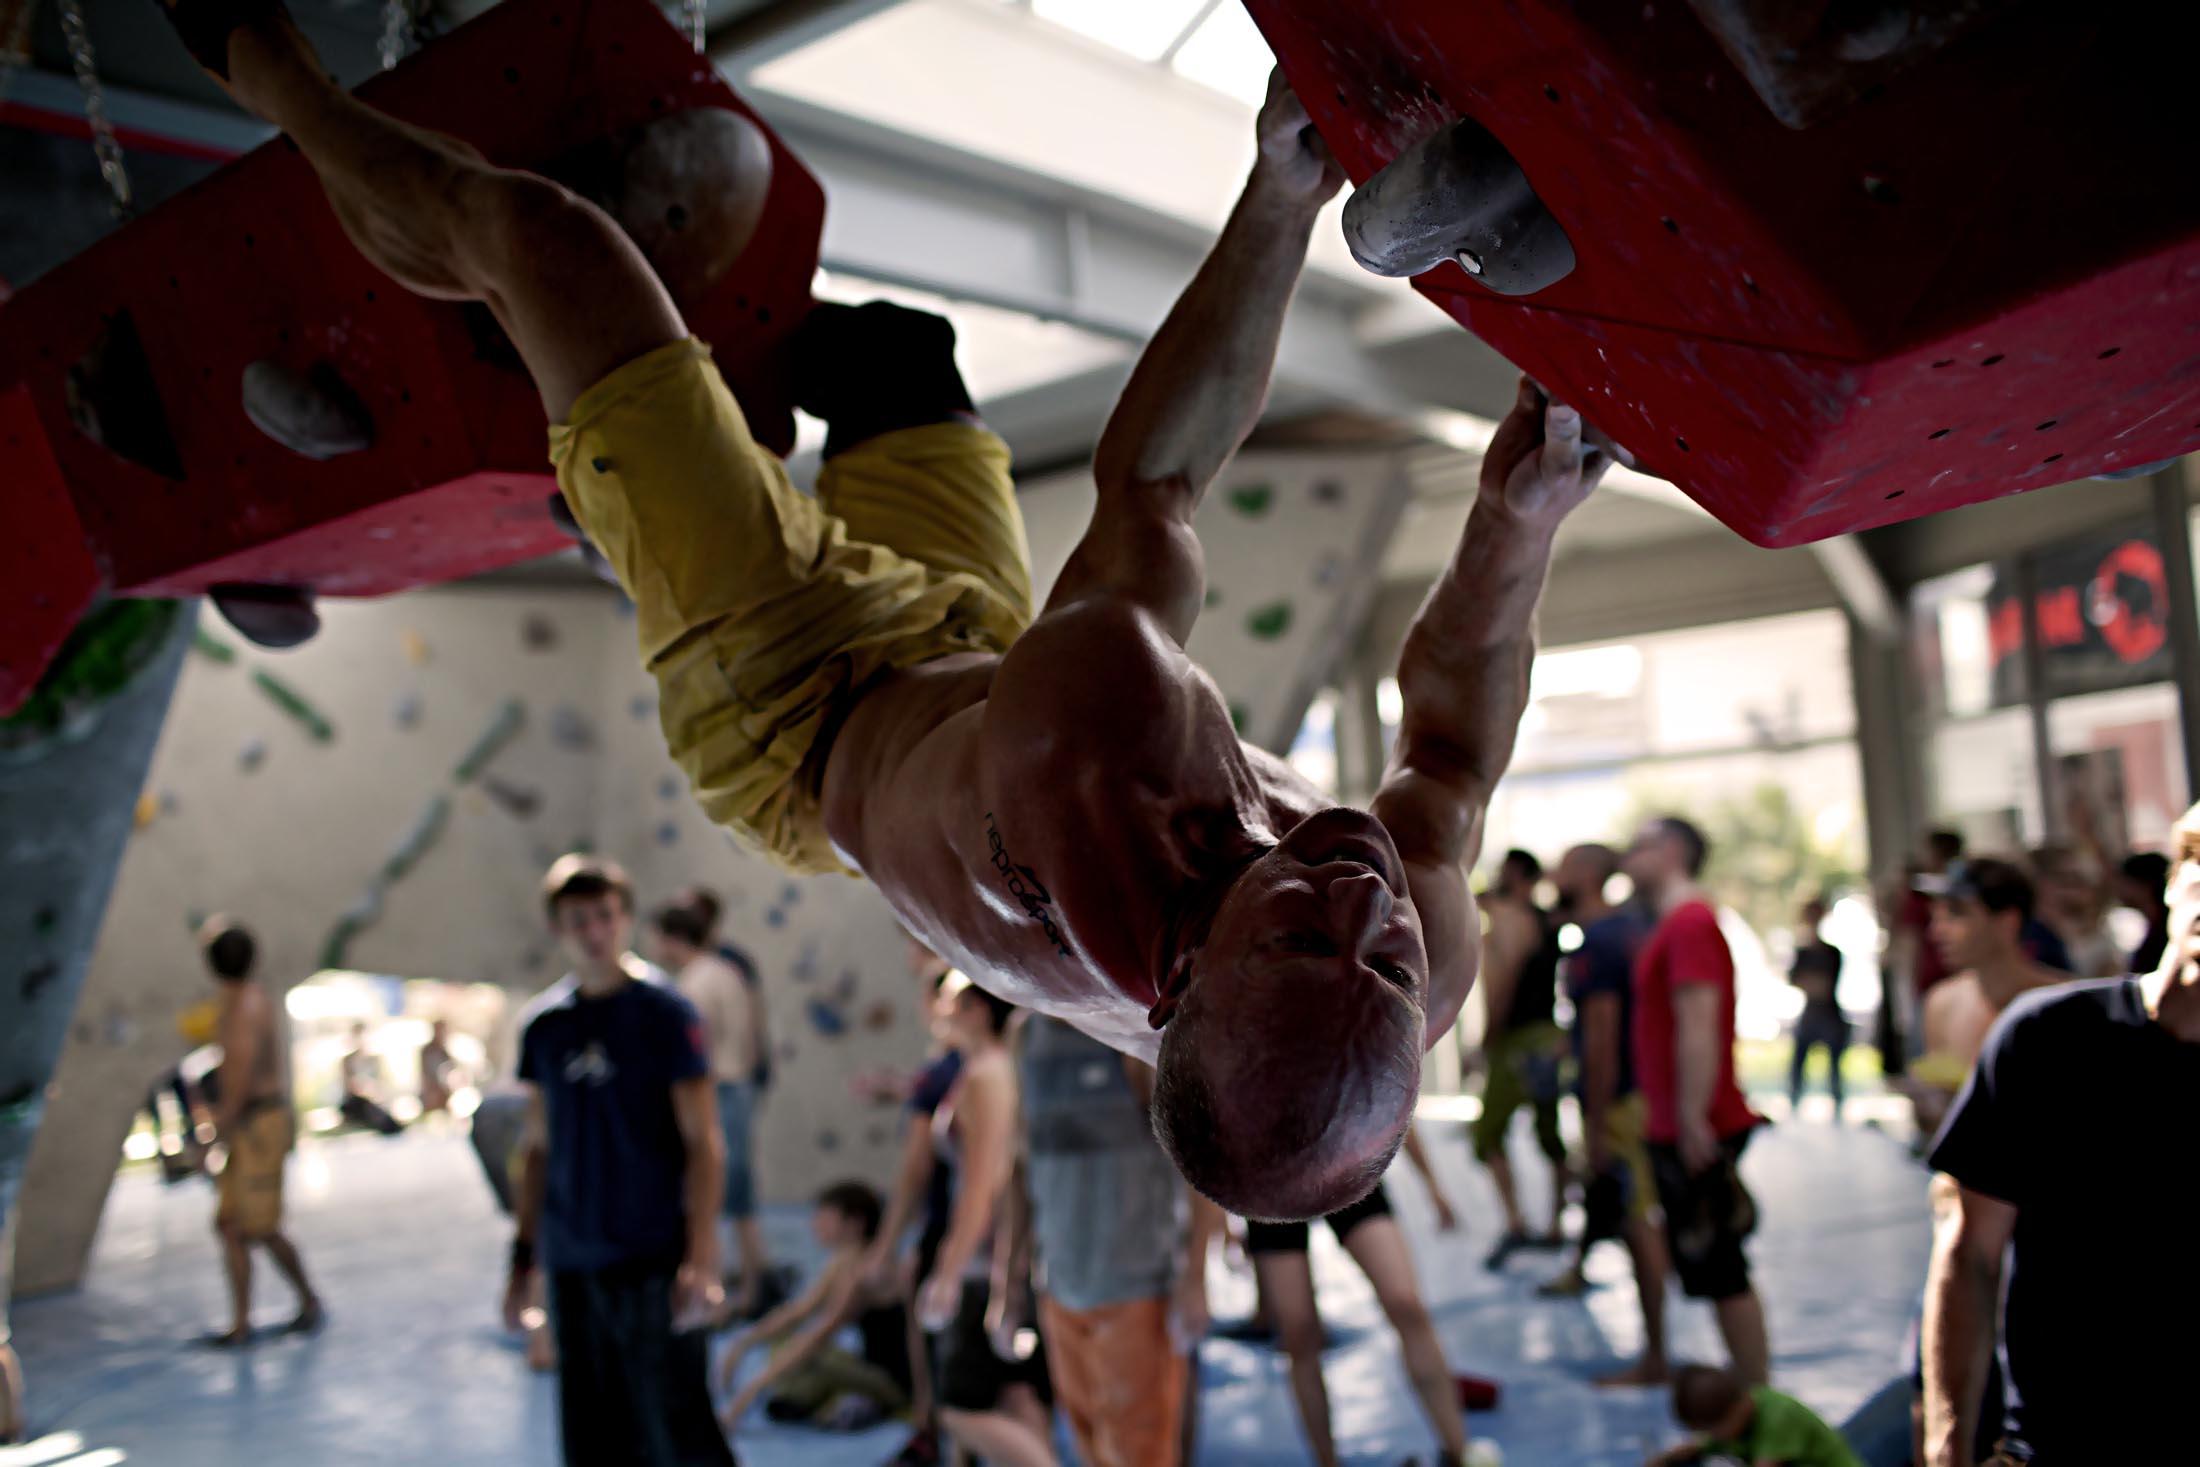 Quali, internationaler bouldercup Frankenjura 2016, BLOCKHELDEN Erlangen, Mammut, Bergfreunde.de, Boulderwettkampf07092016417